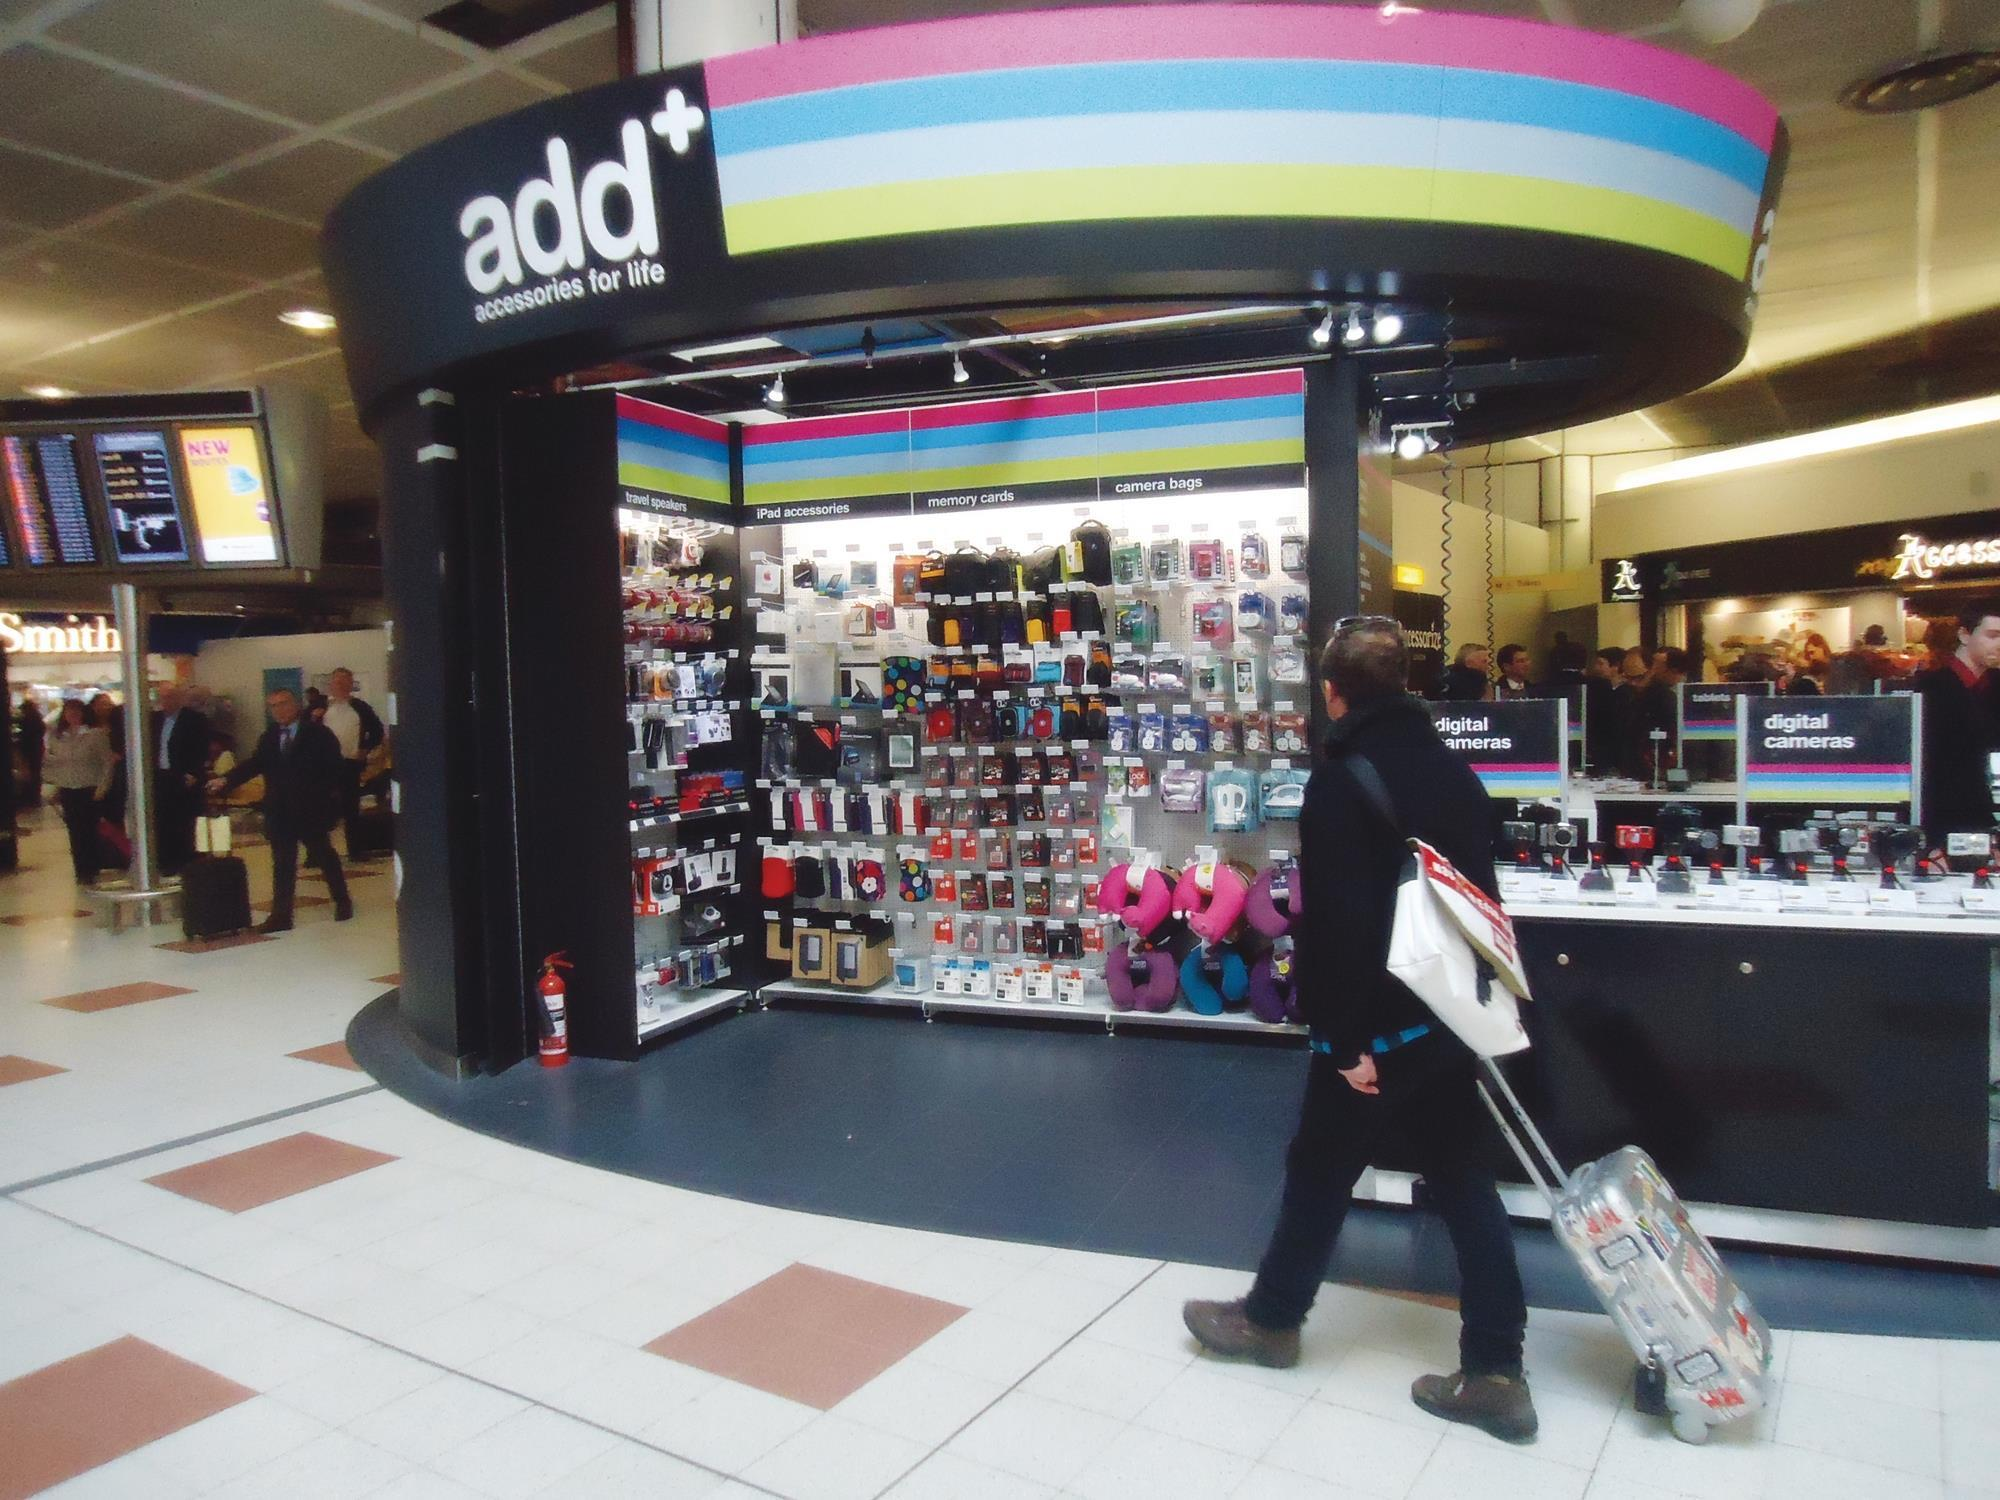 Dixons Add stores get new look | Photo gallery | Retail Week